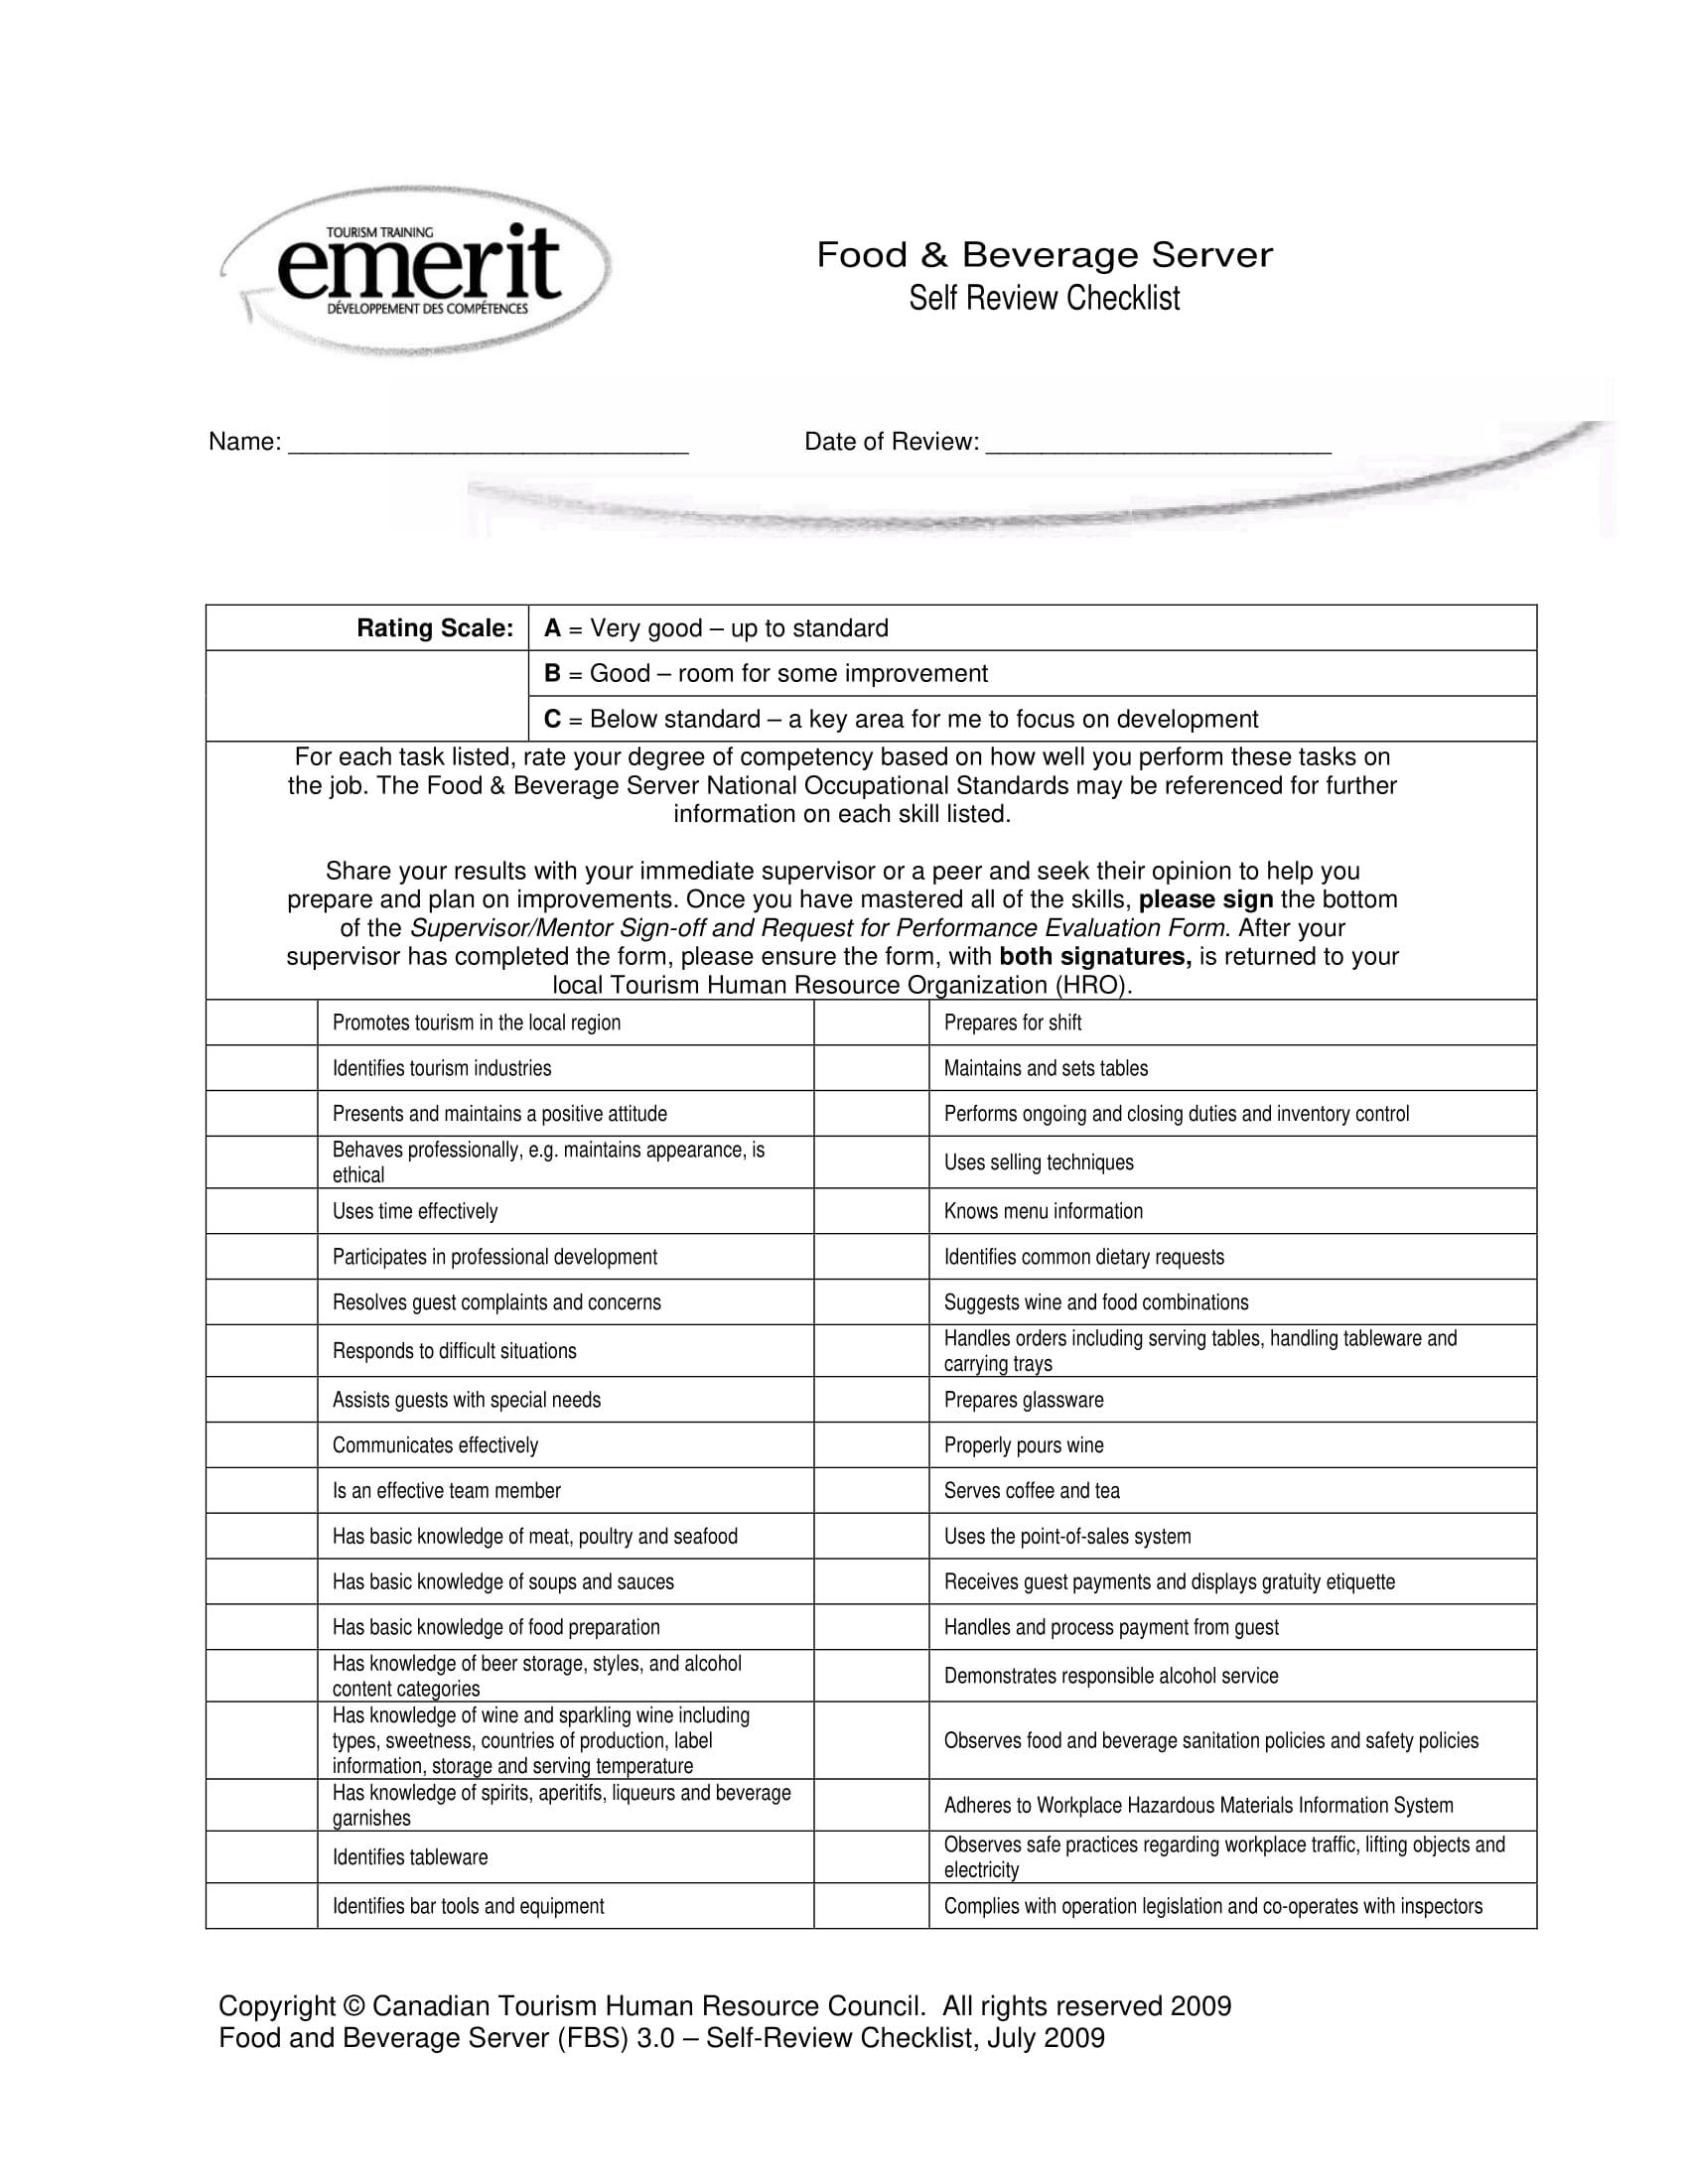 restaurant employee self assessment form 1